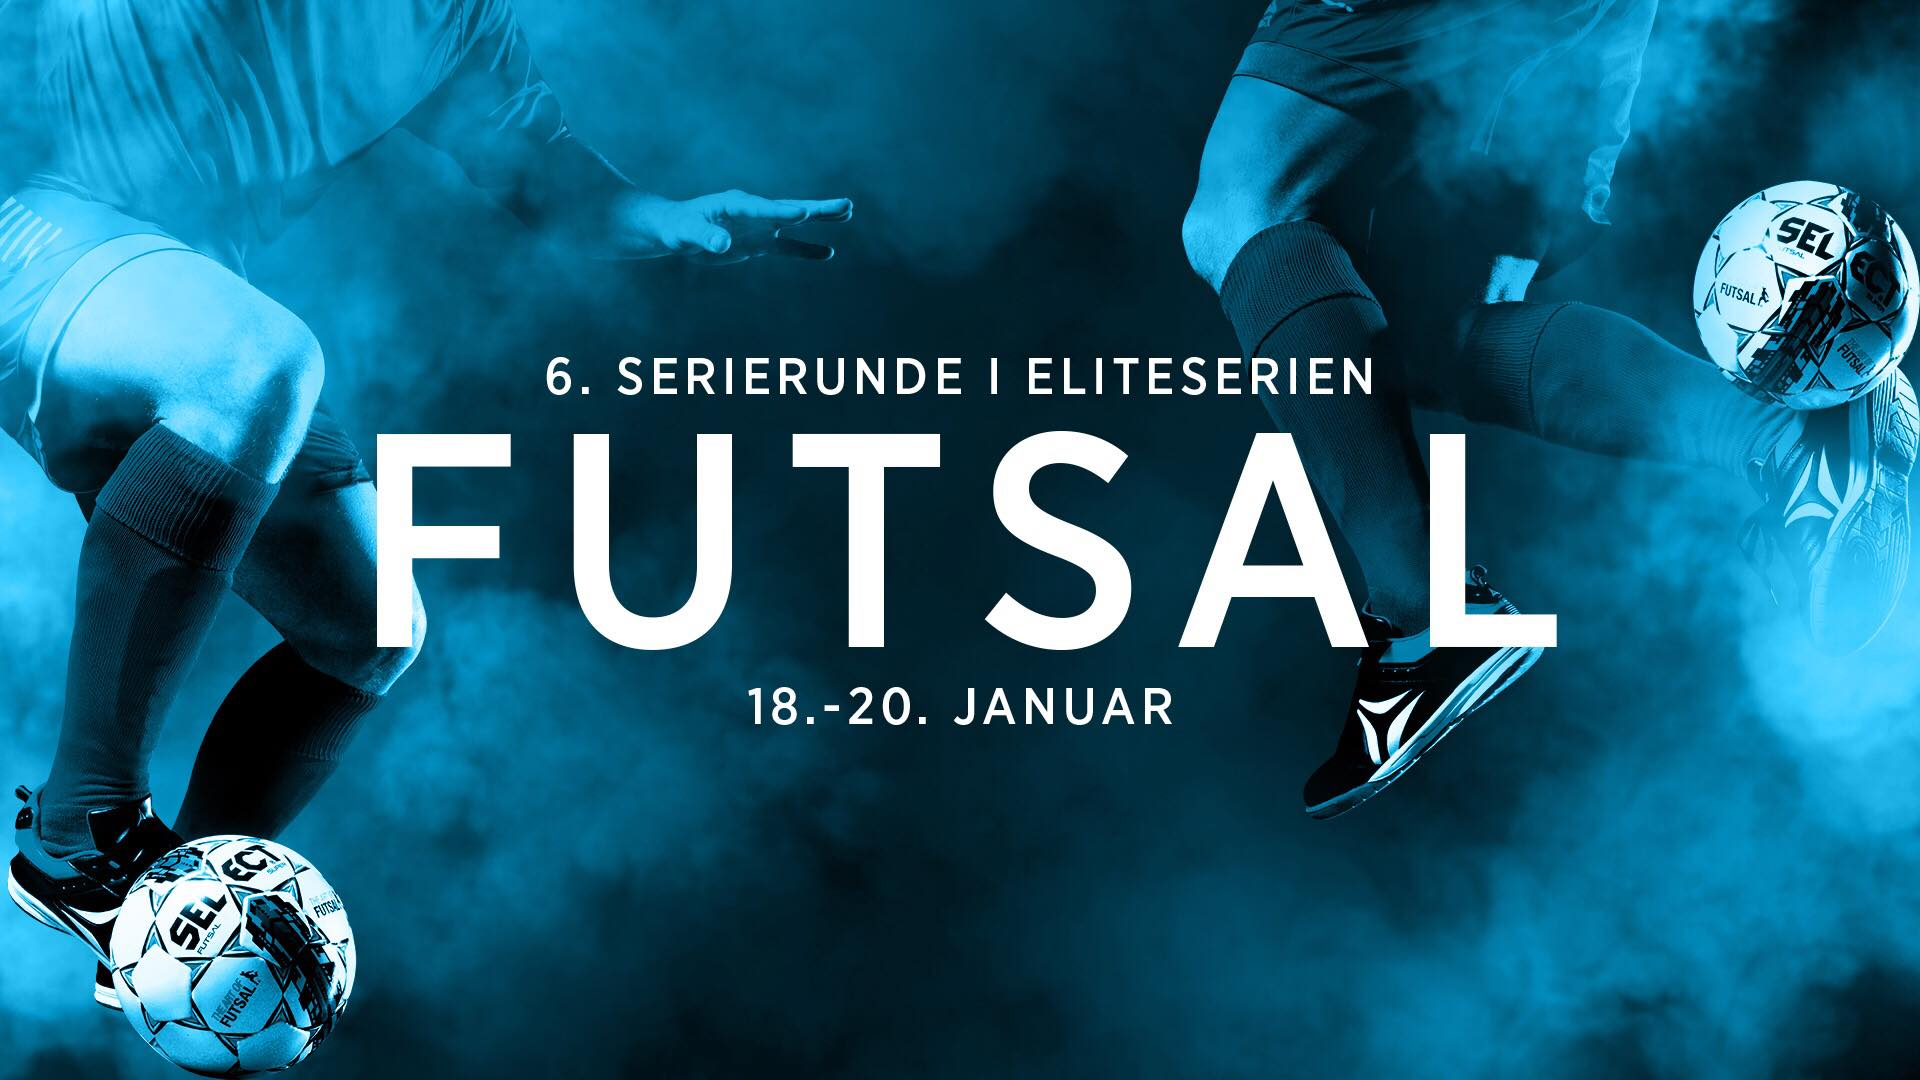 6. serierunde i Eliteserien futsal